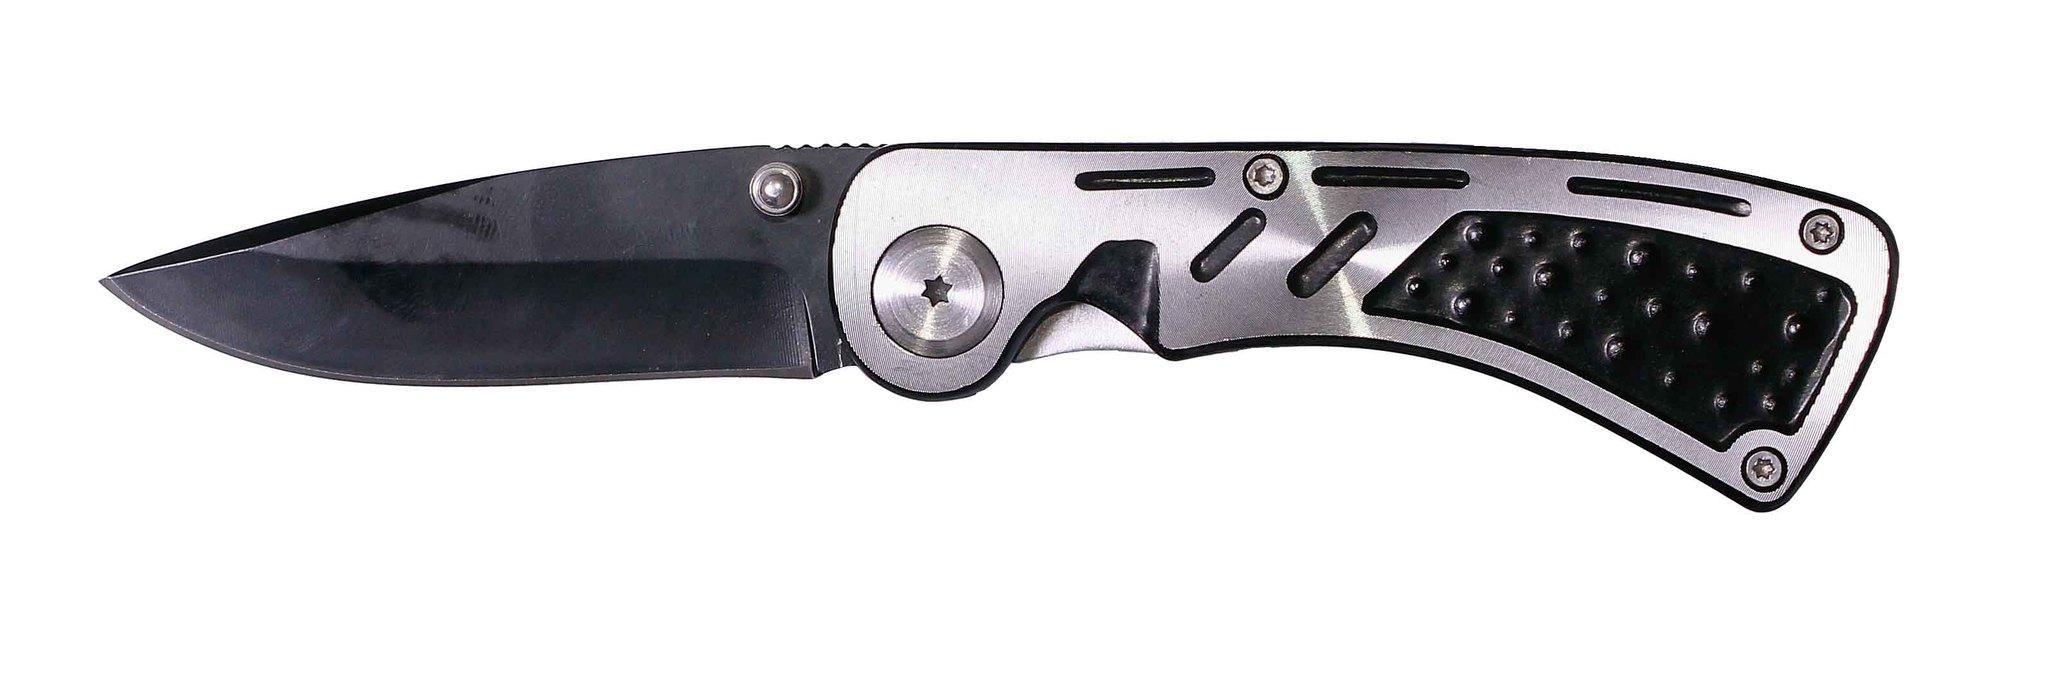 Нож складной Stinger SL297, сталь 420, алюминий фото